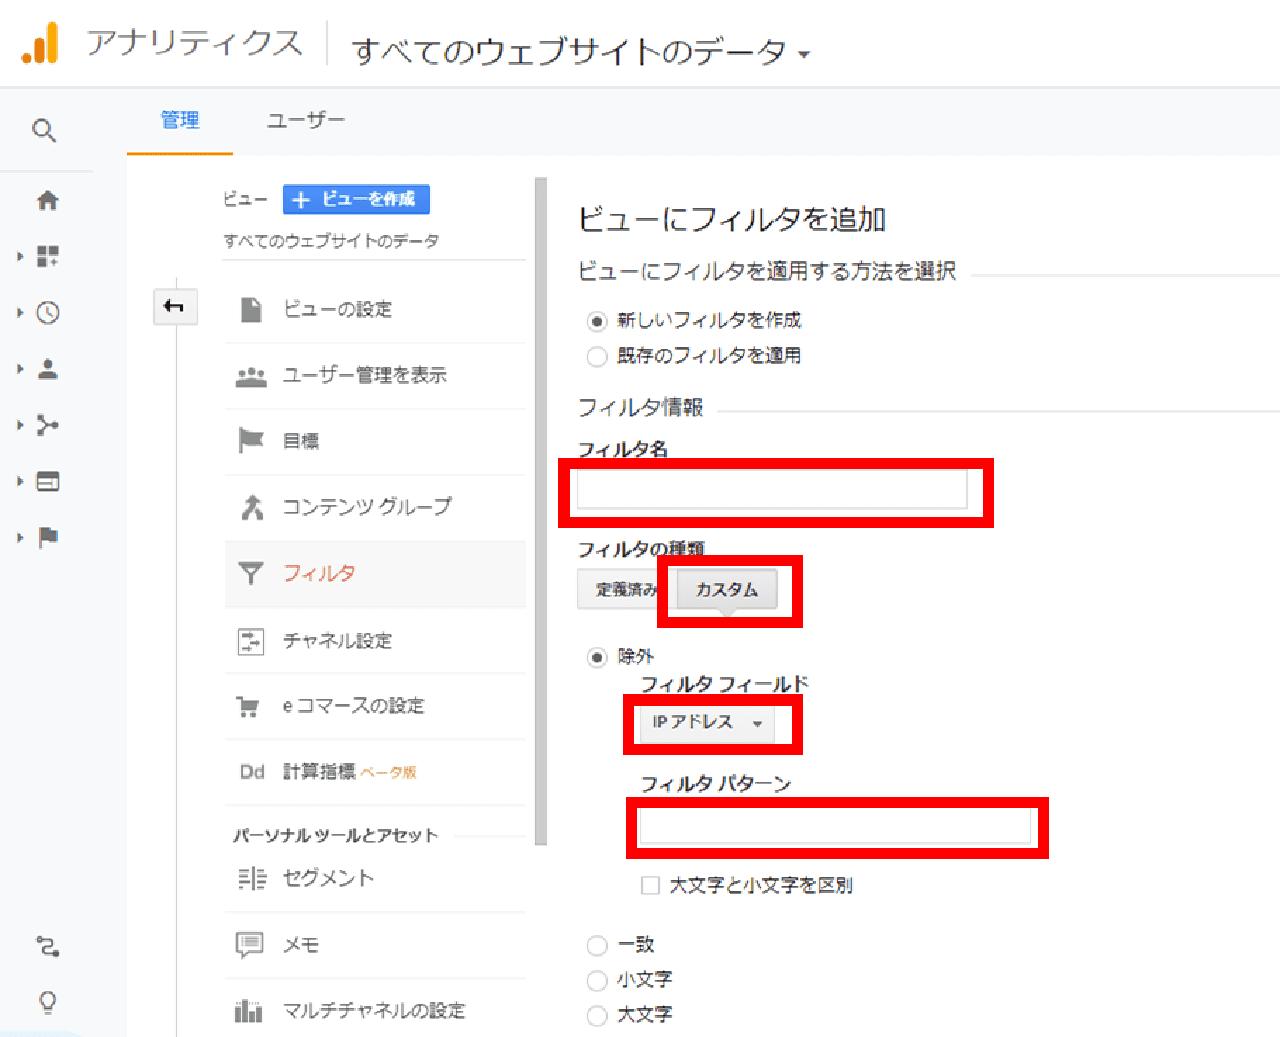 google-analytics-access-exclusion3-1